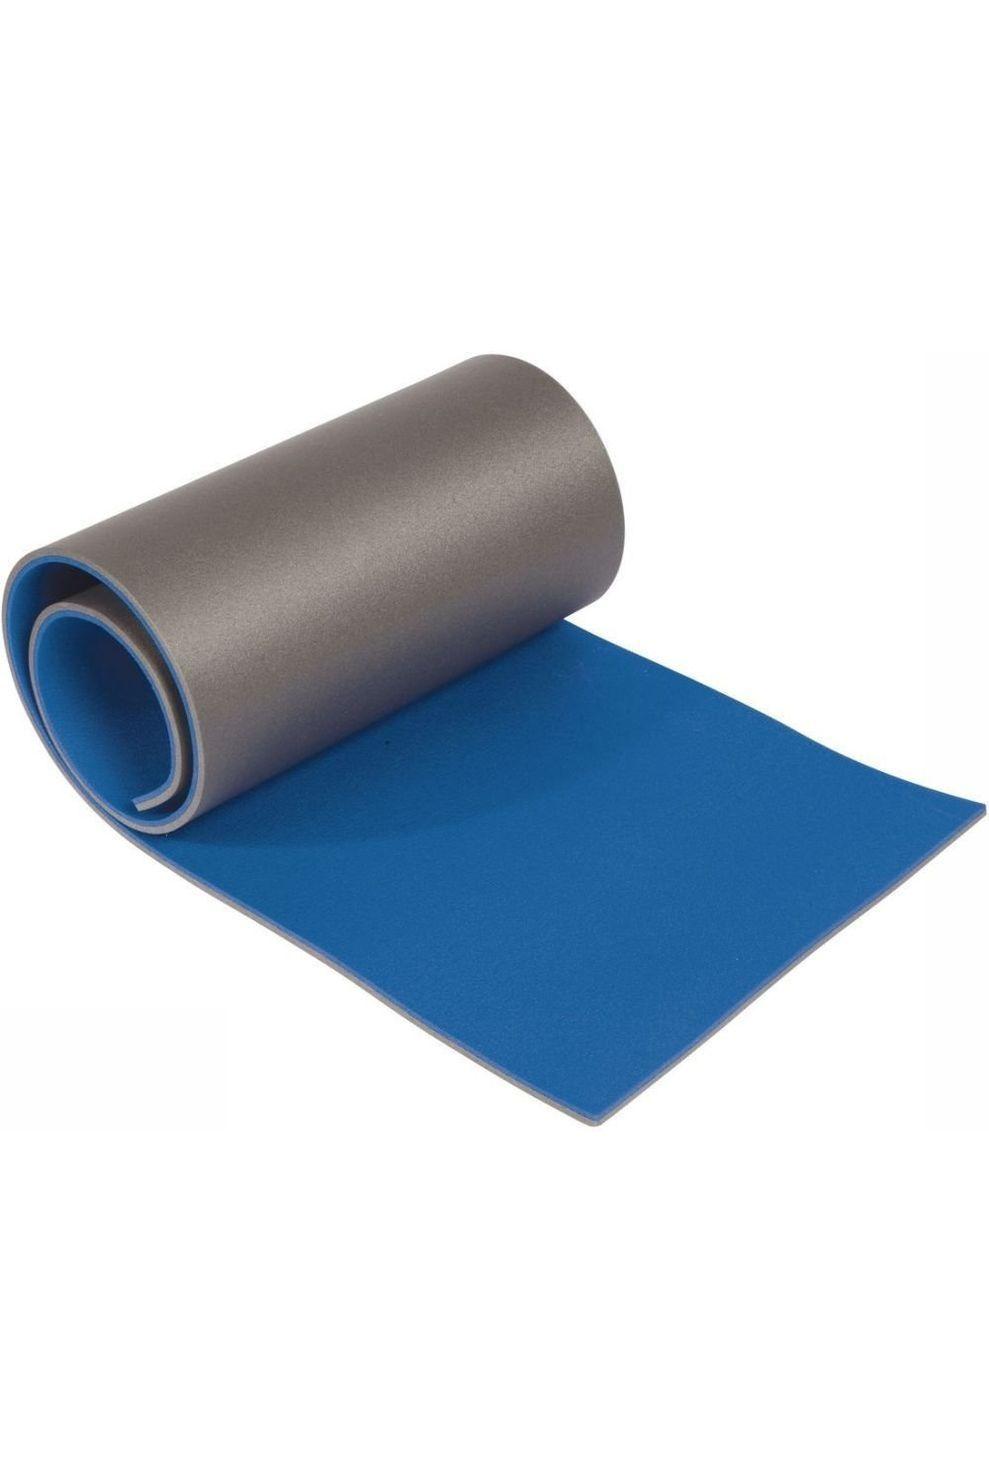 Bo-Camp Slaapmat Schuimmat 180 X 50 X 1,2 Cm - Blauw/Grijs